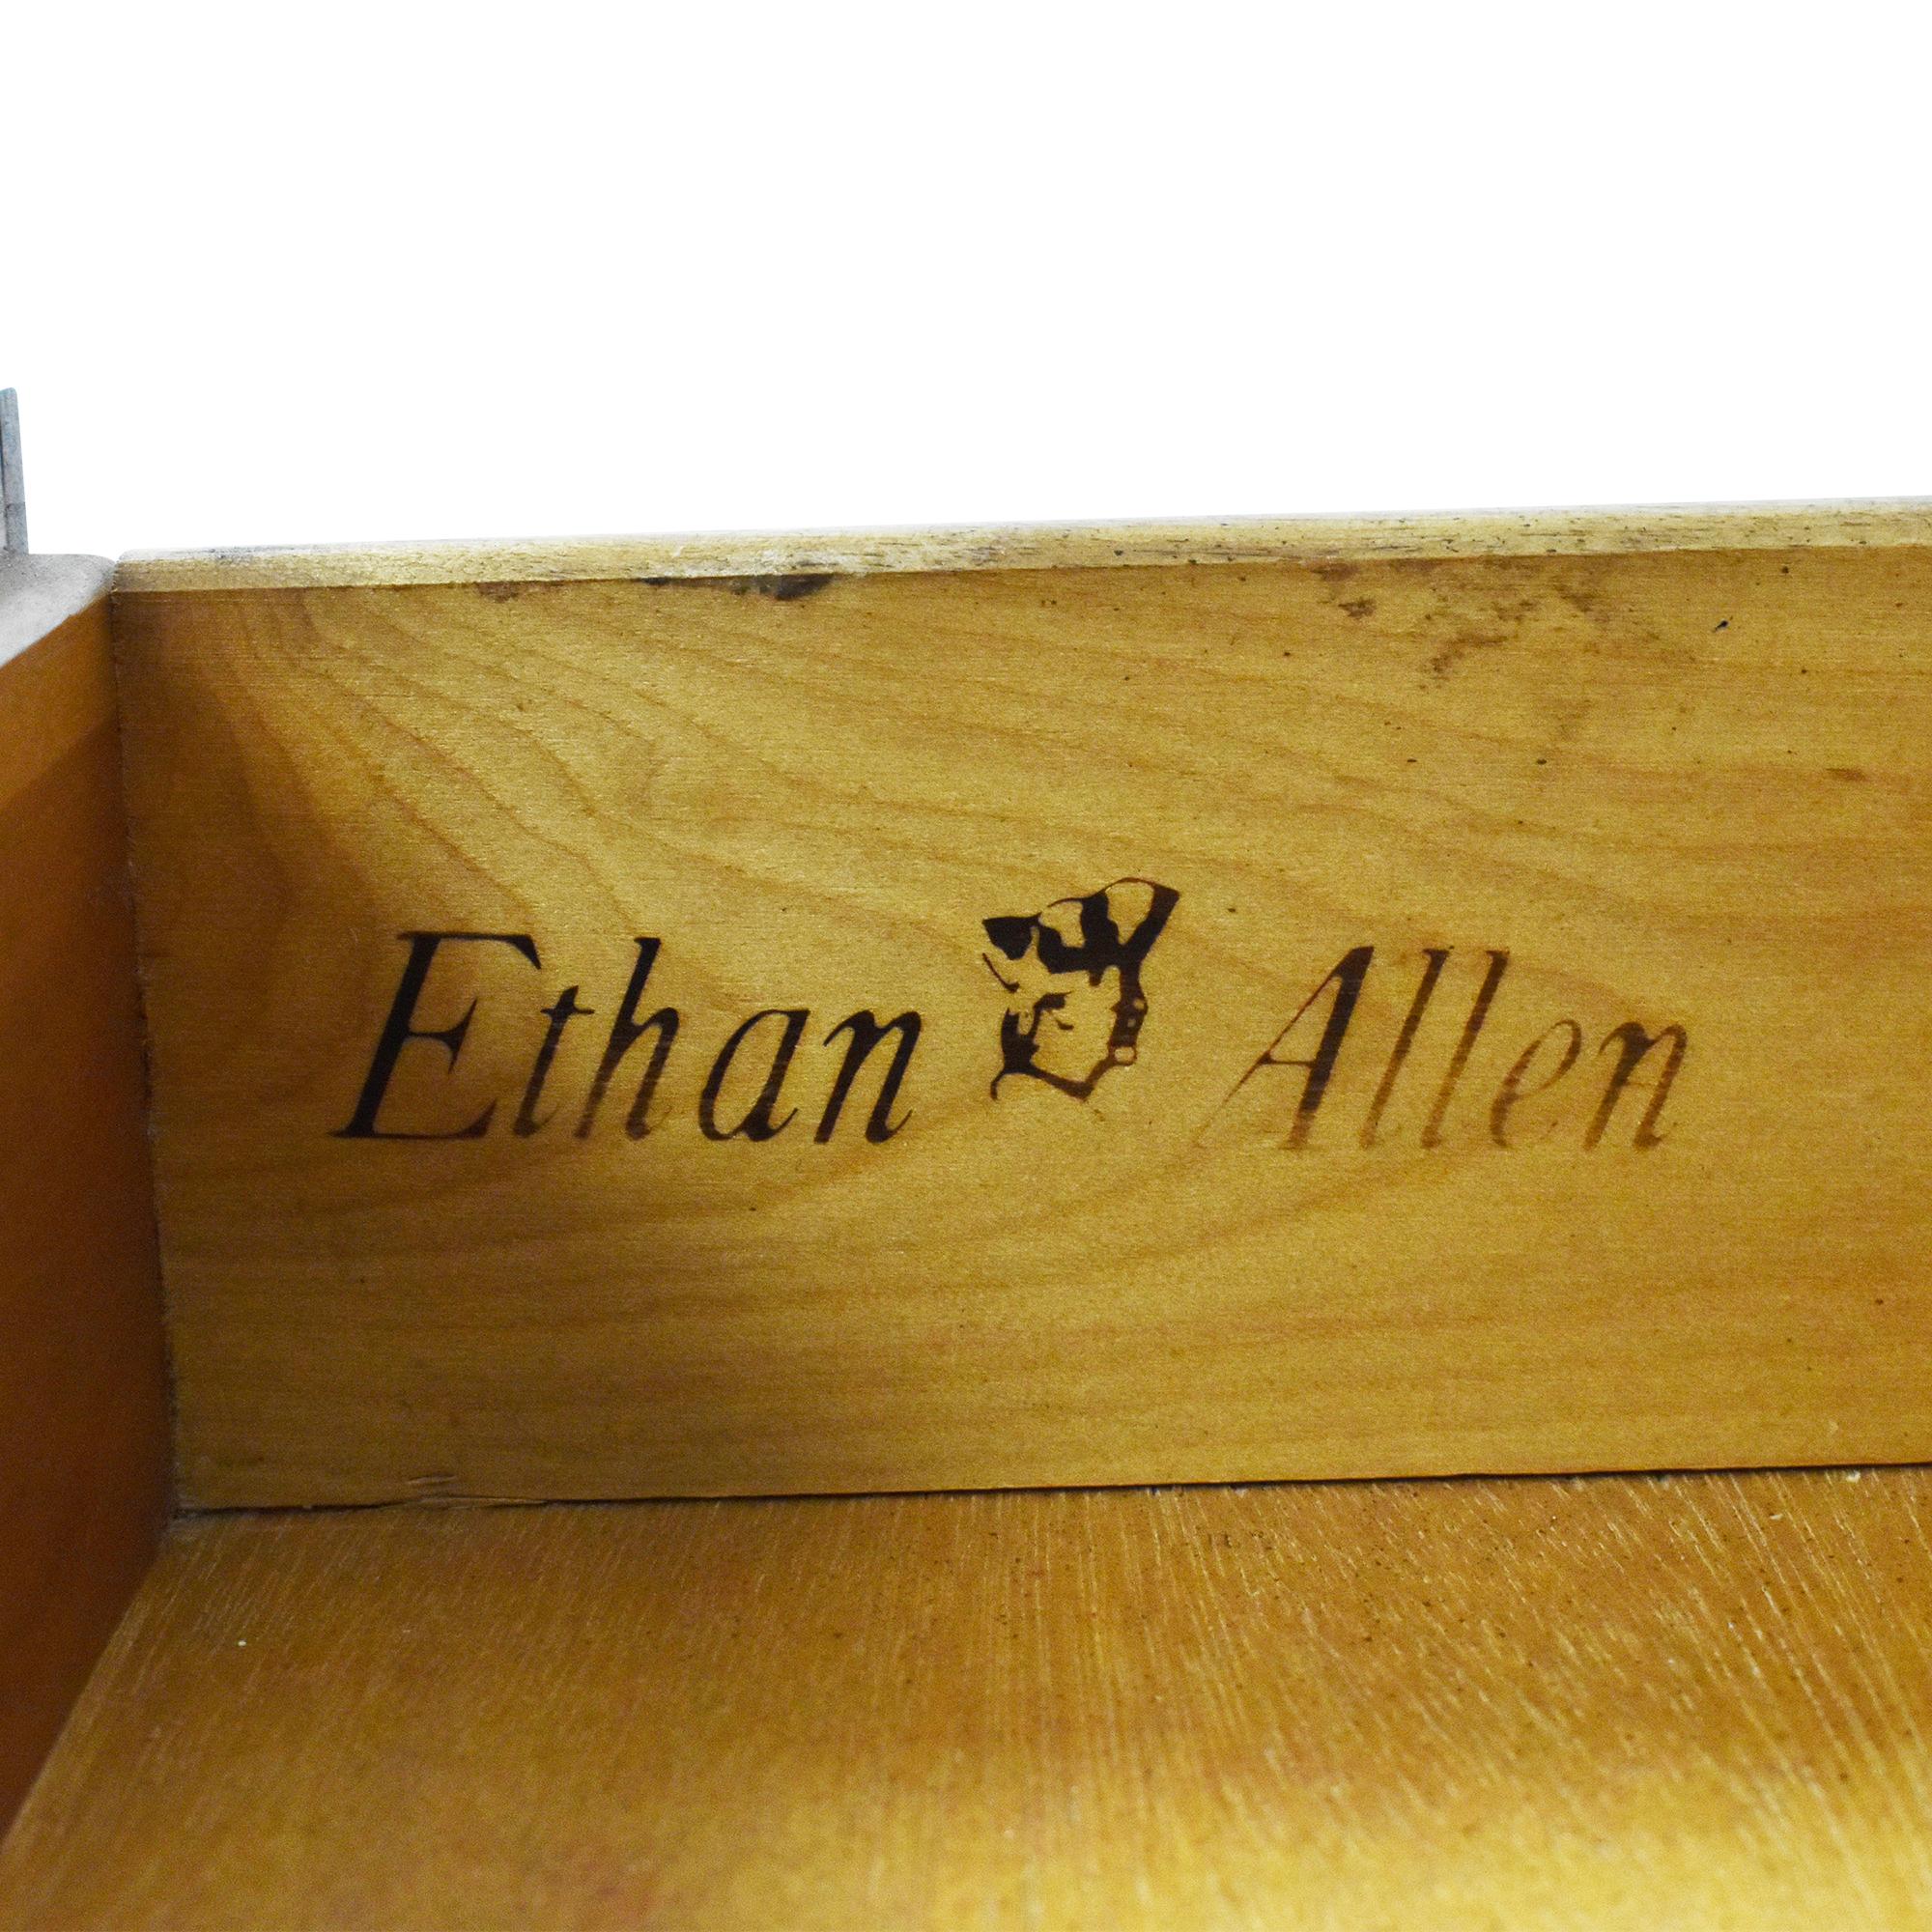 Ethan Allen Ethan Allen Drop-Leaf Server for sale